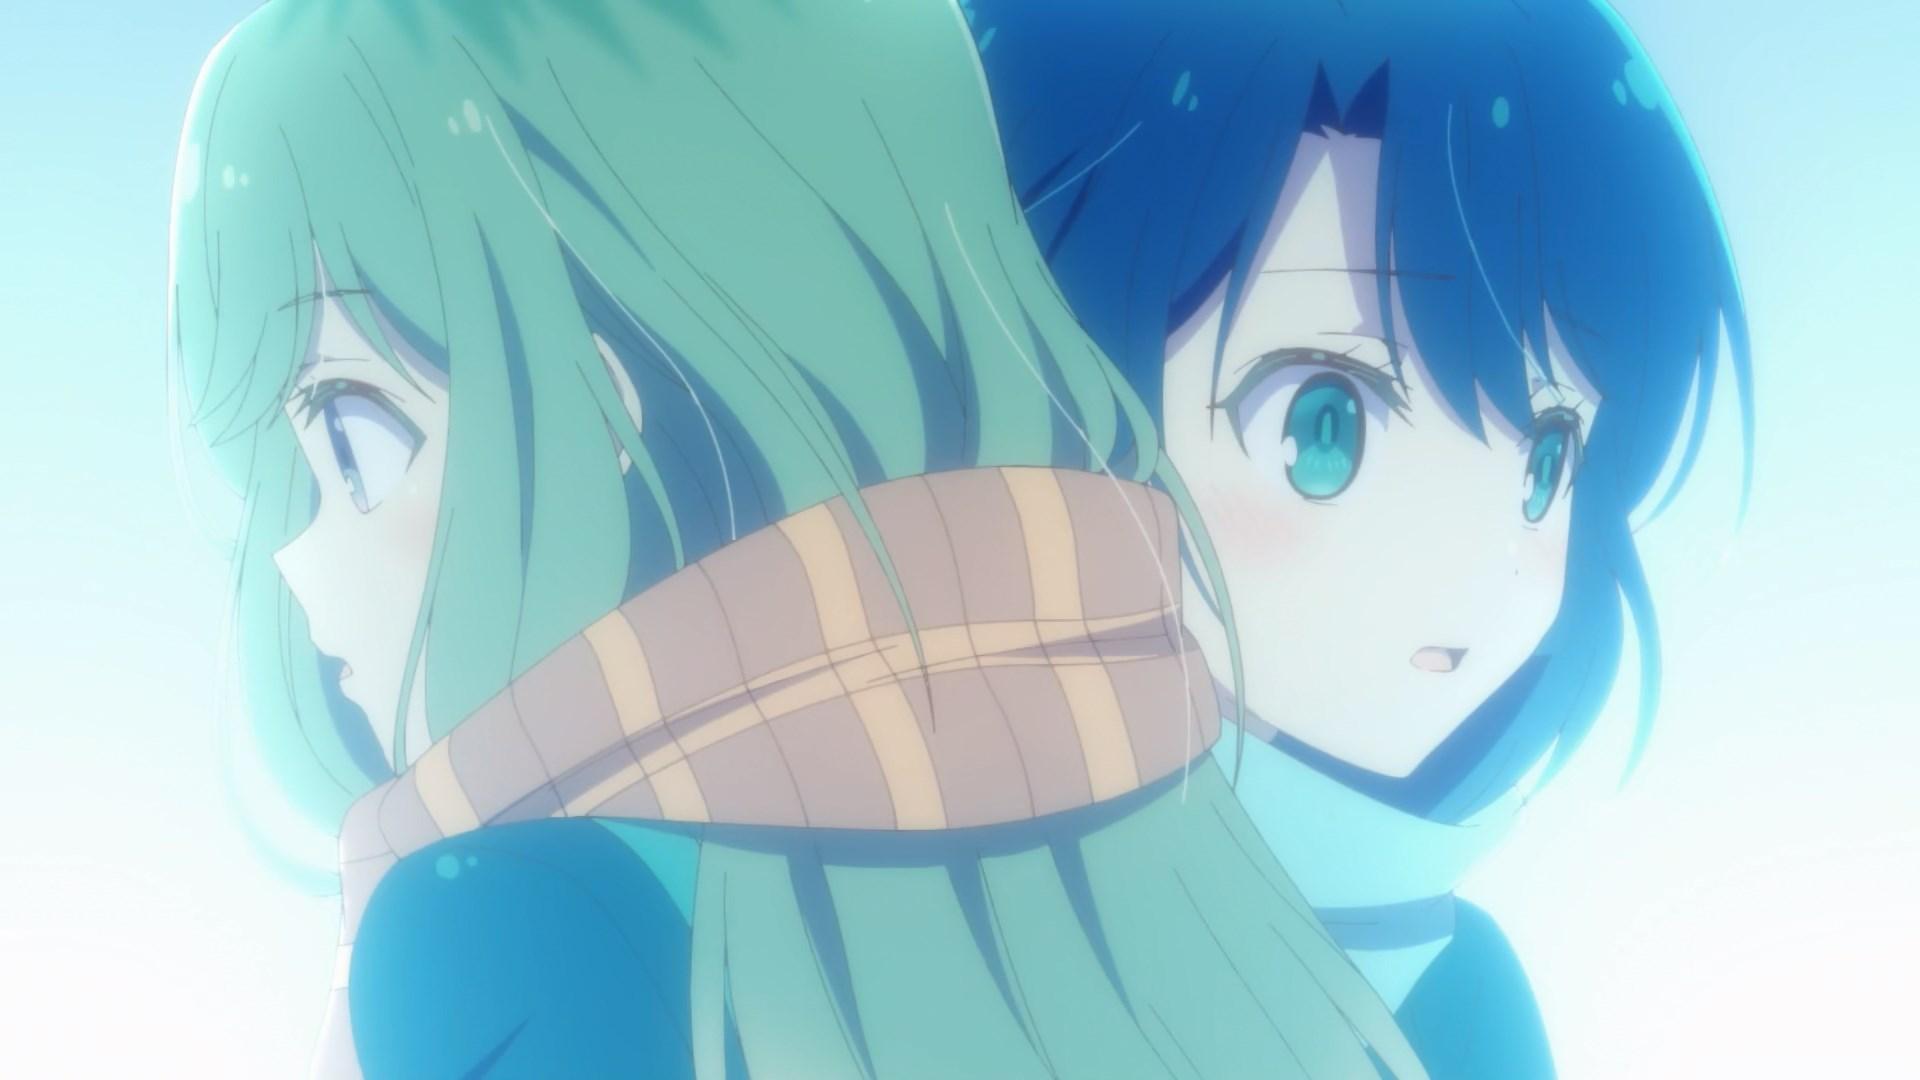 Shimamura saved Adachi from falling